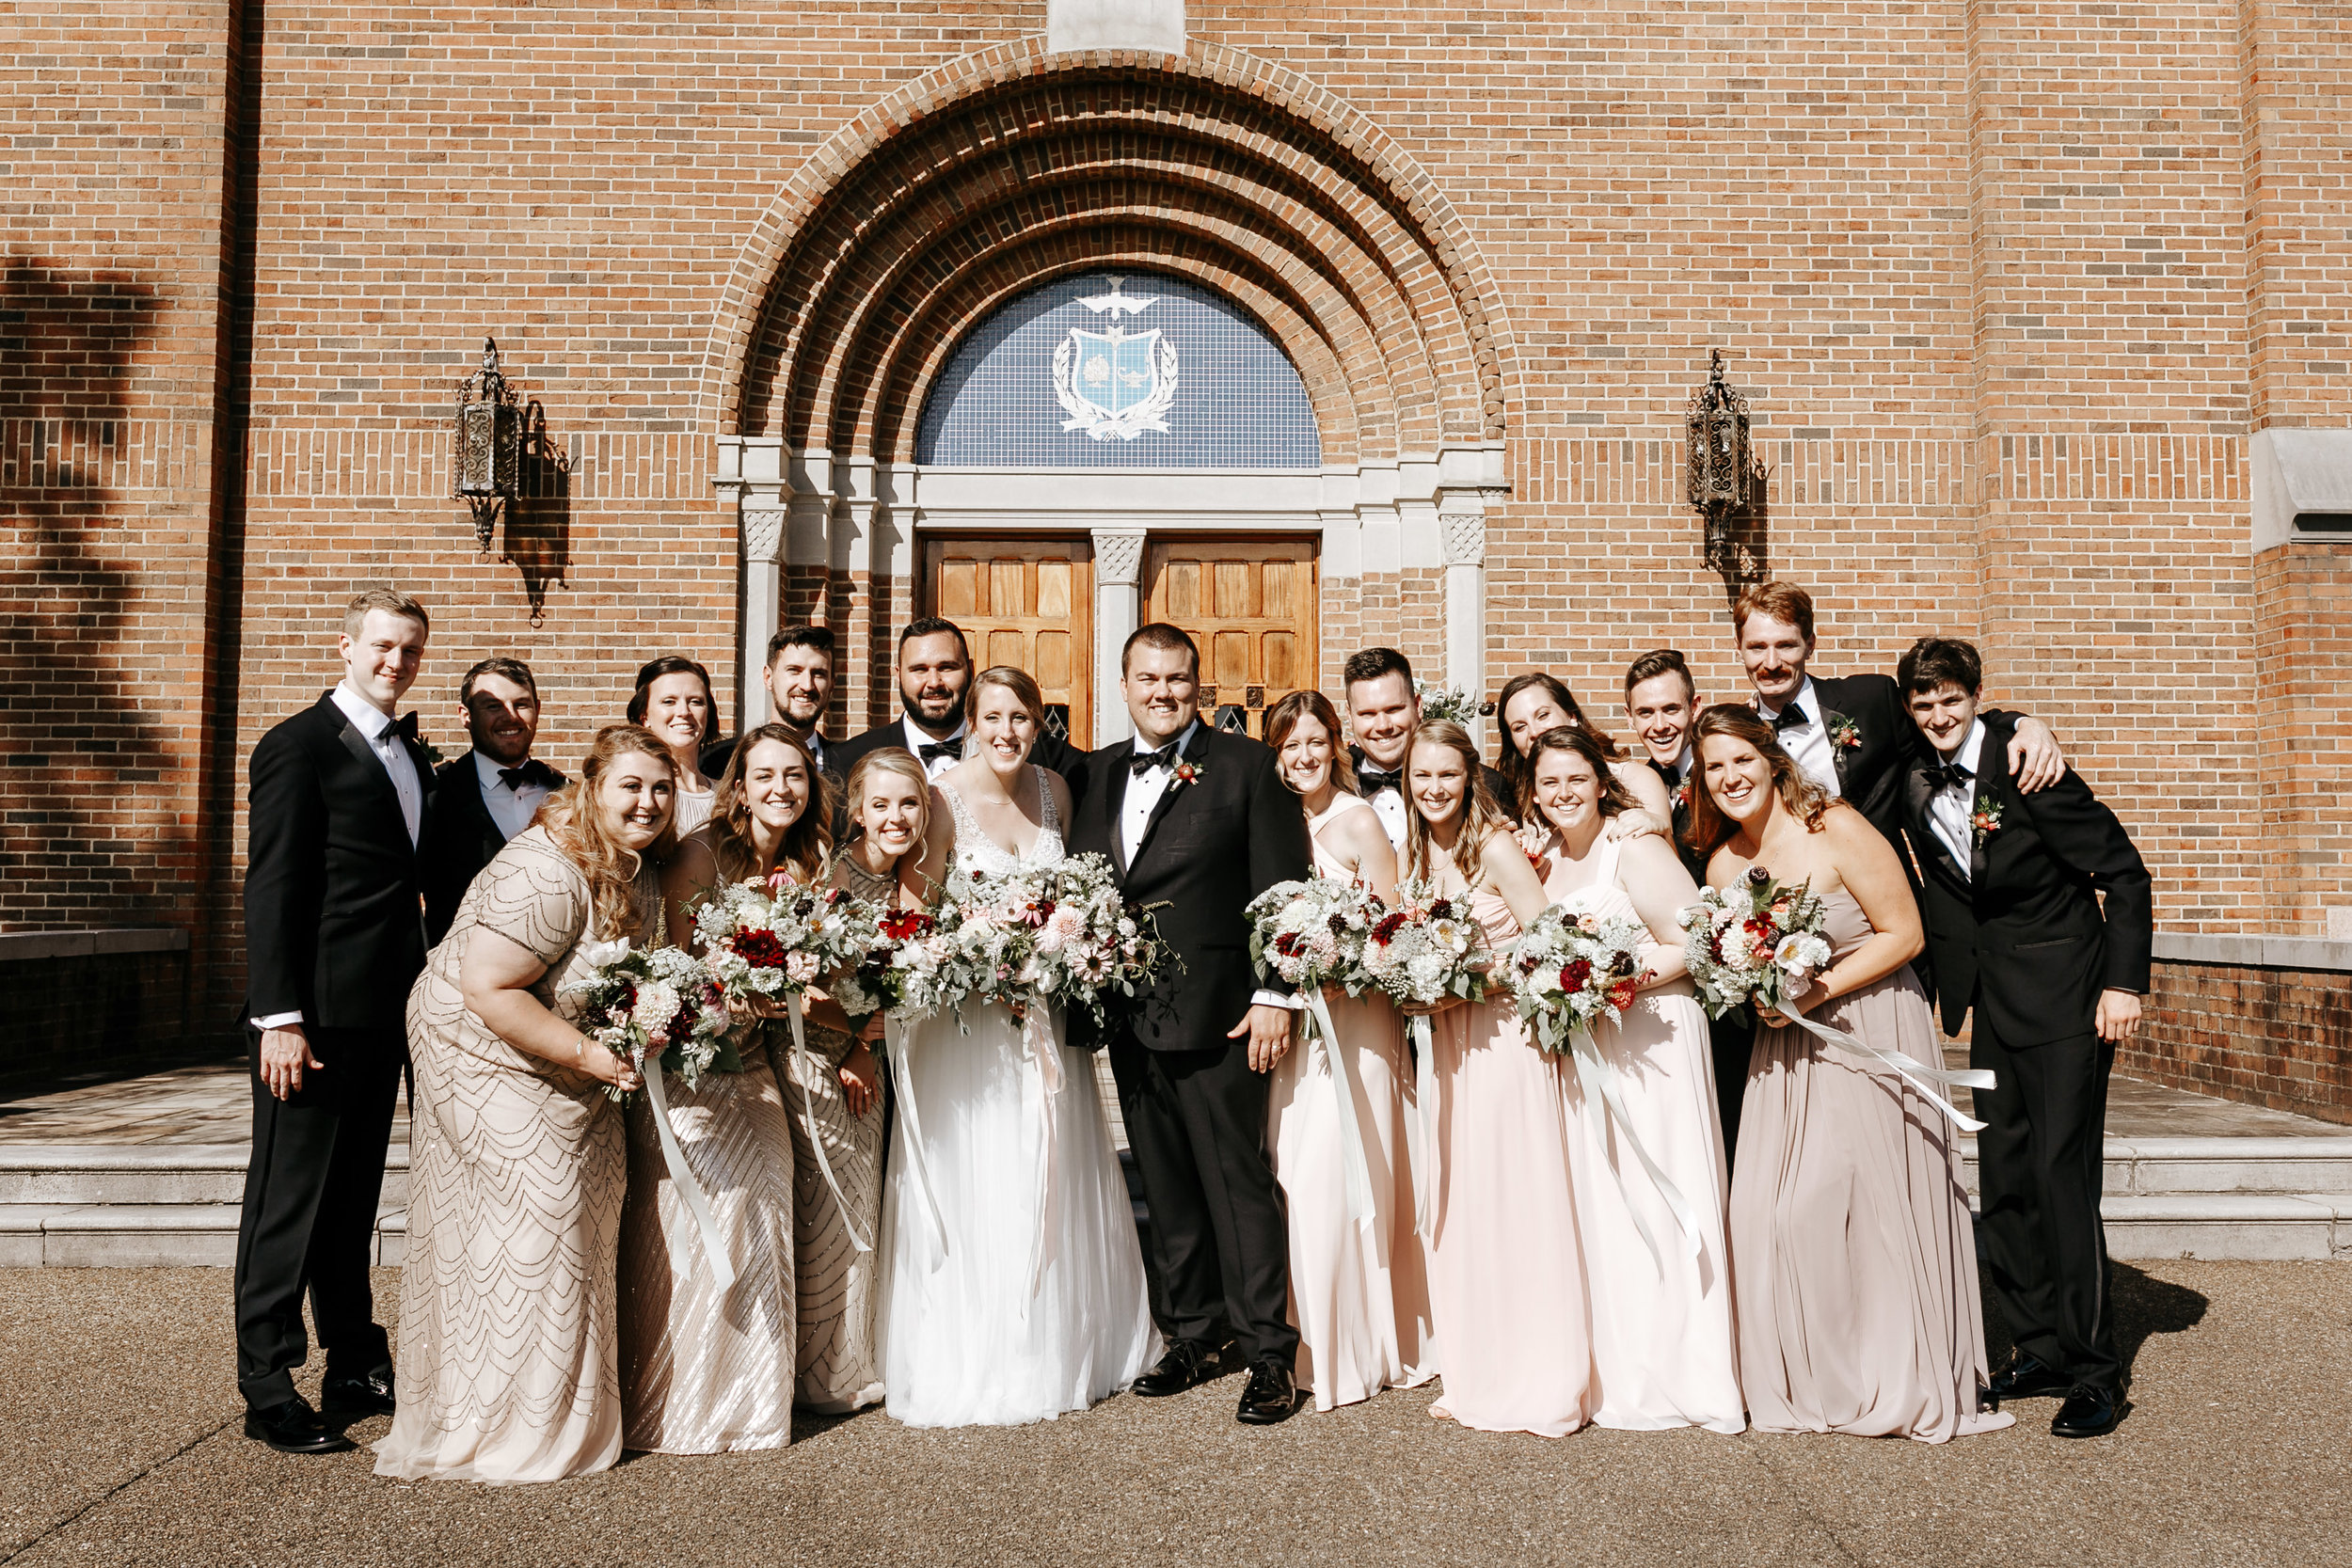 bohemian-photographer-wedding-tennessee-36.jpg